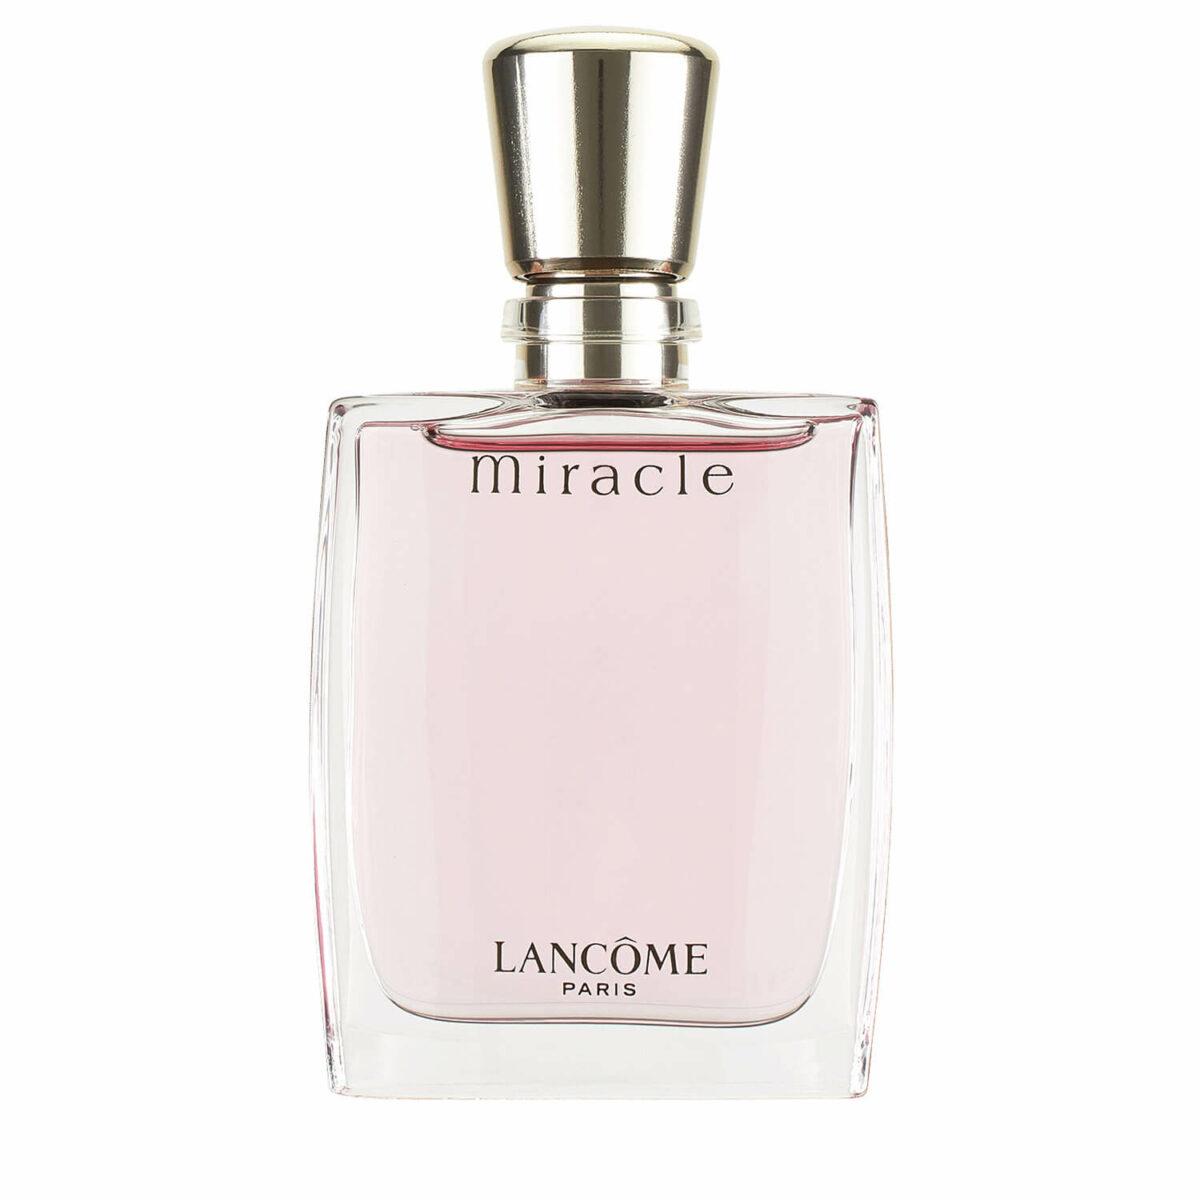 Lancome-Miracle-main